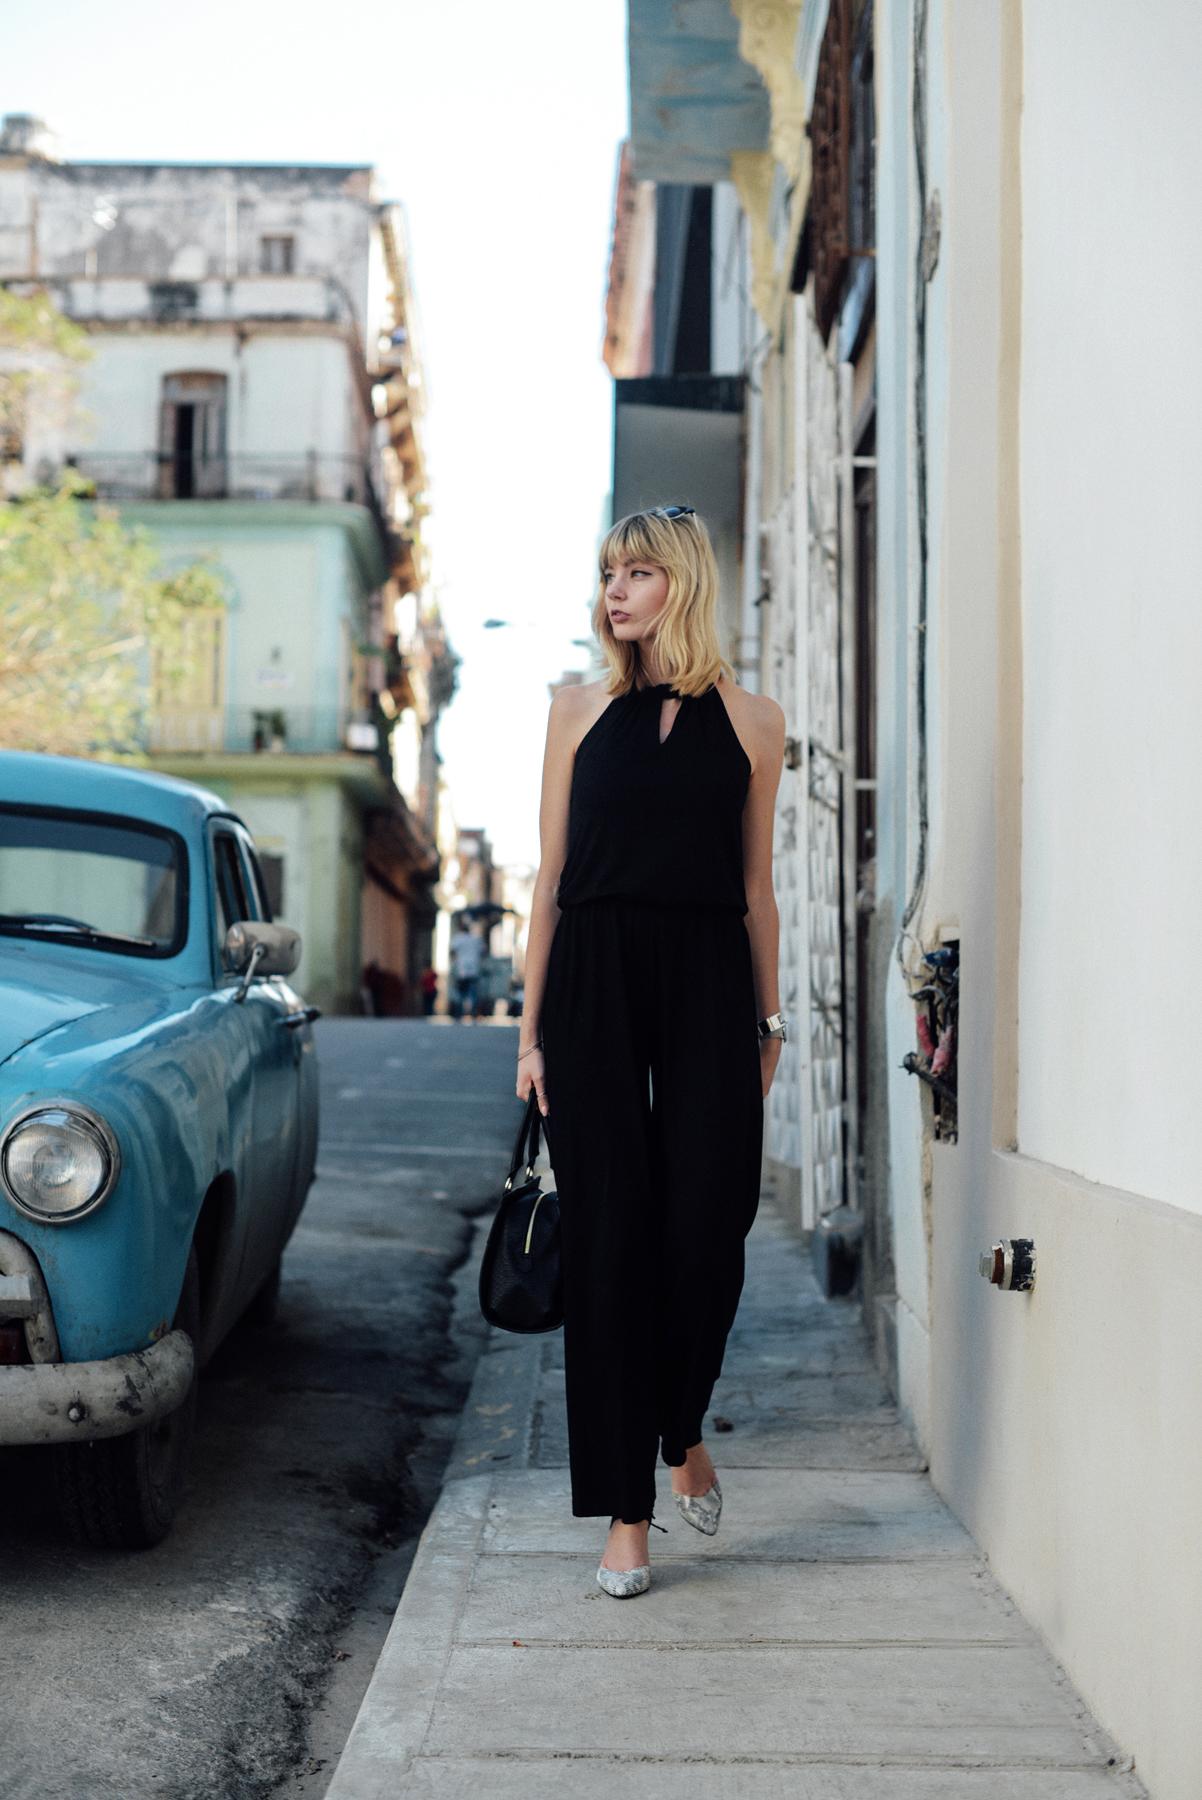 Kiamisu_Modeblog_Fashionblog_Alba Moda_Jumpsuit_Havanna_La Haban Vieja_Kuba Outfit-final10